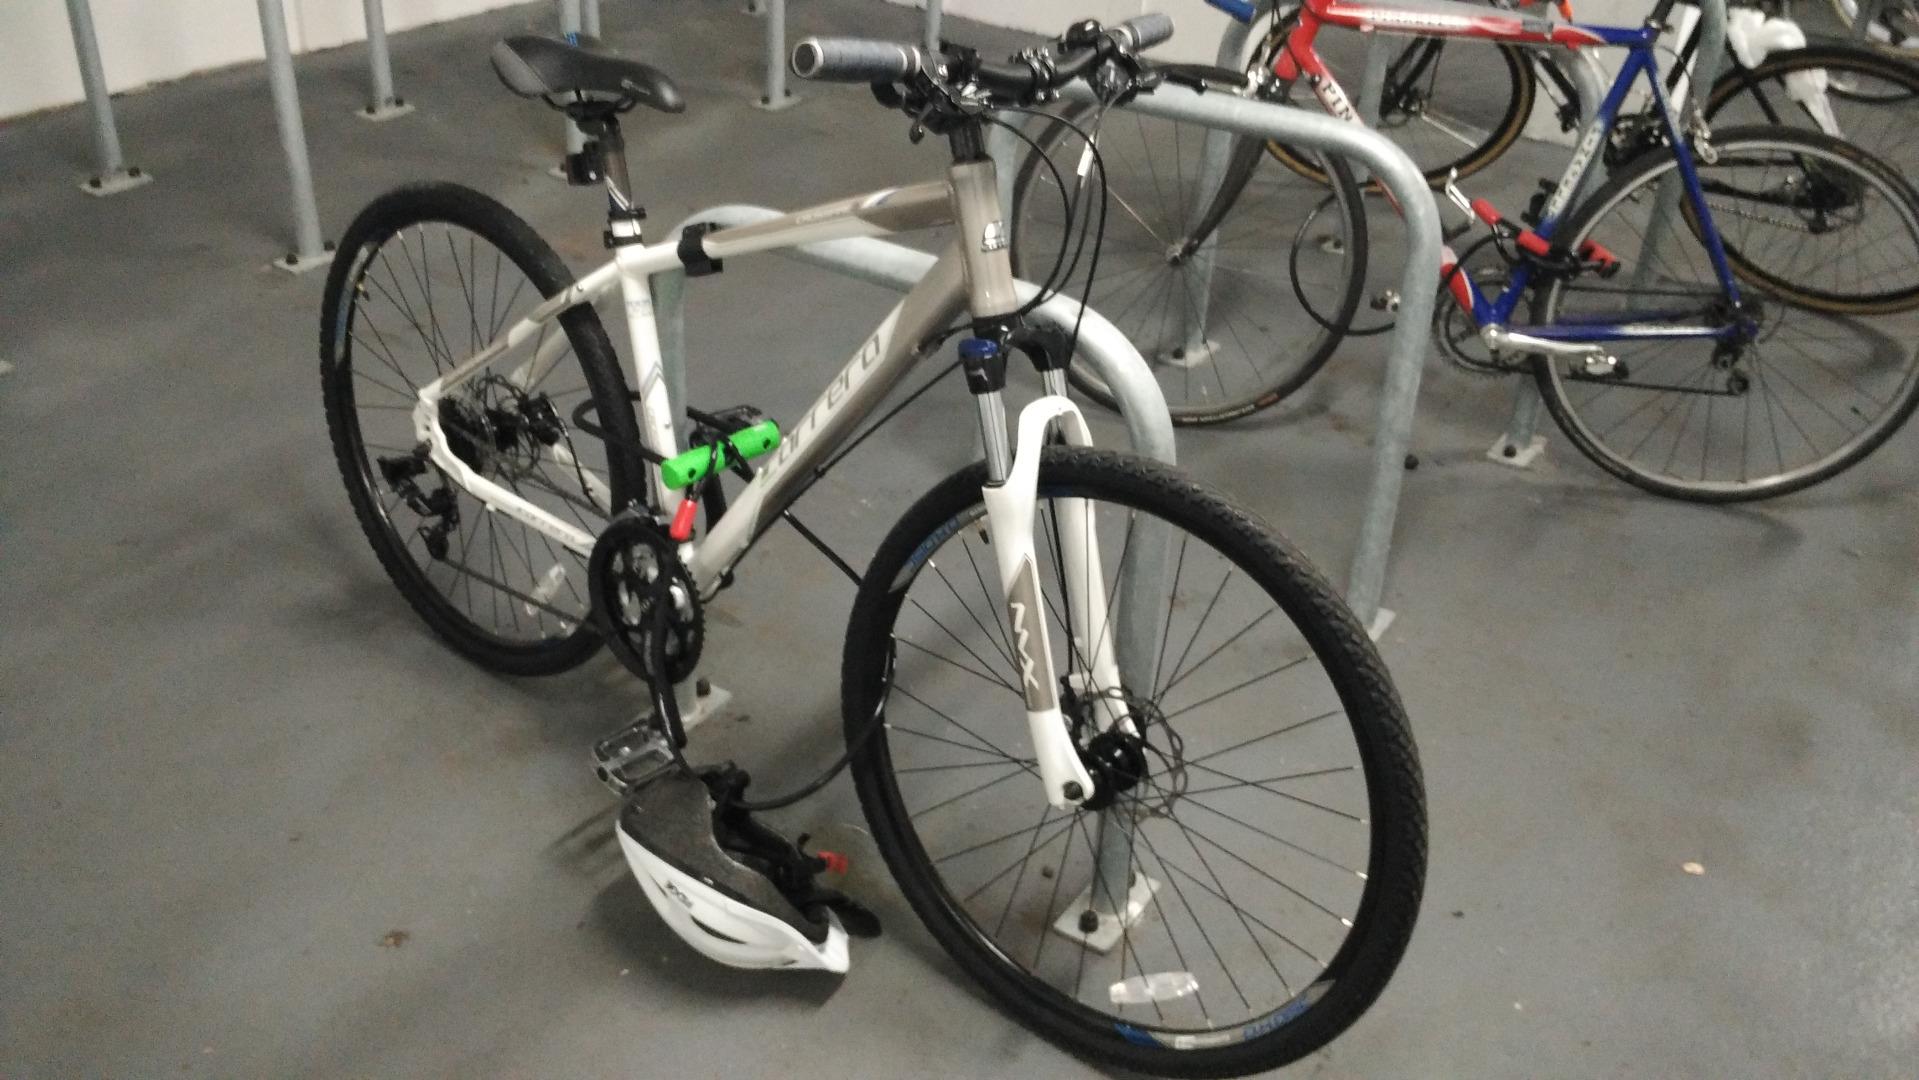 Stolen Carrera bicycles Crossfire 3